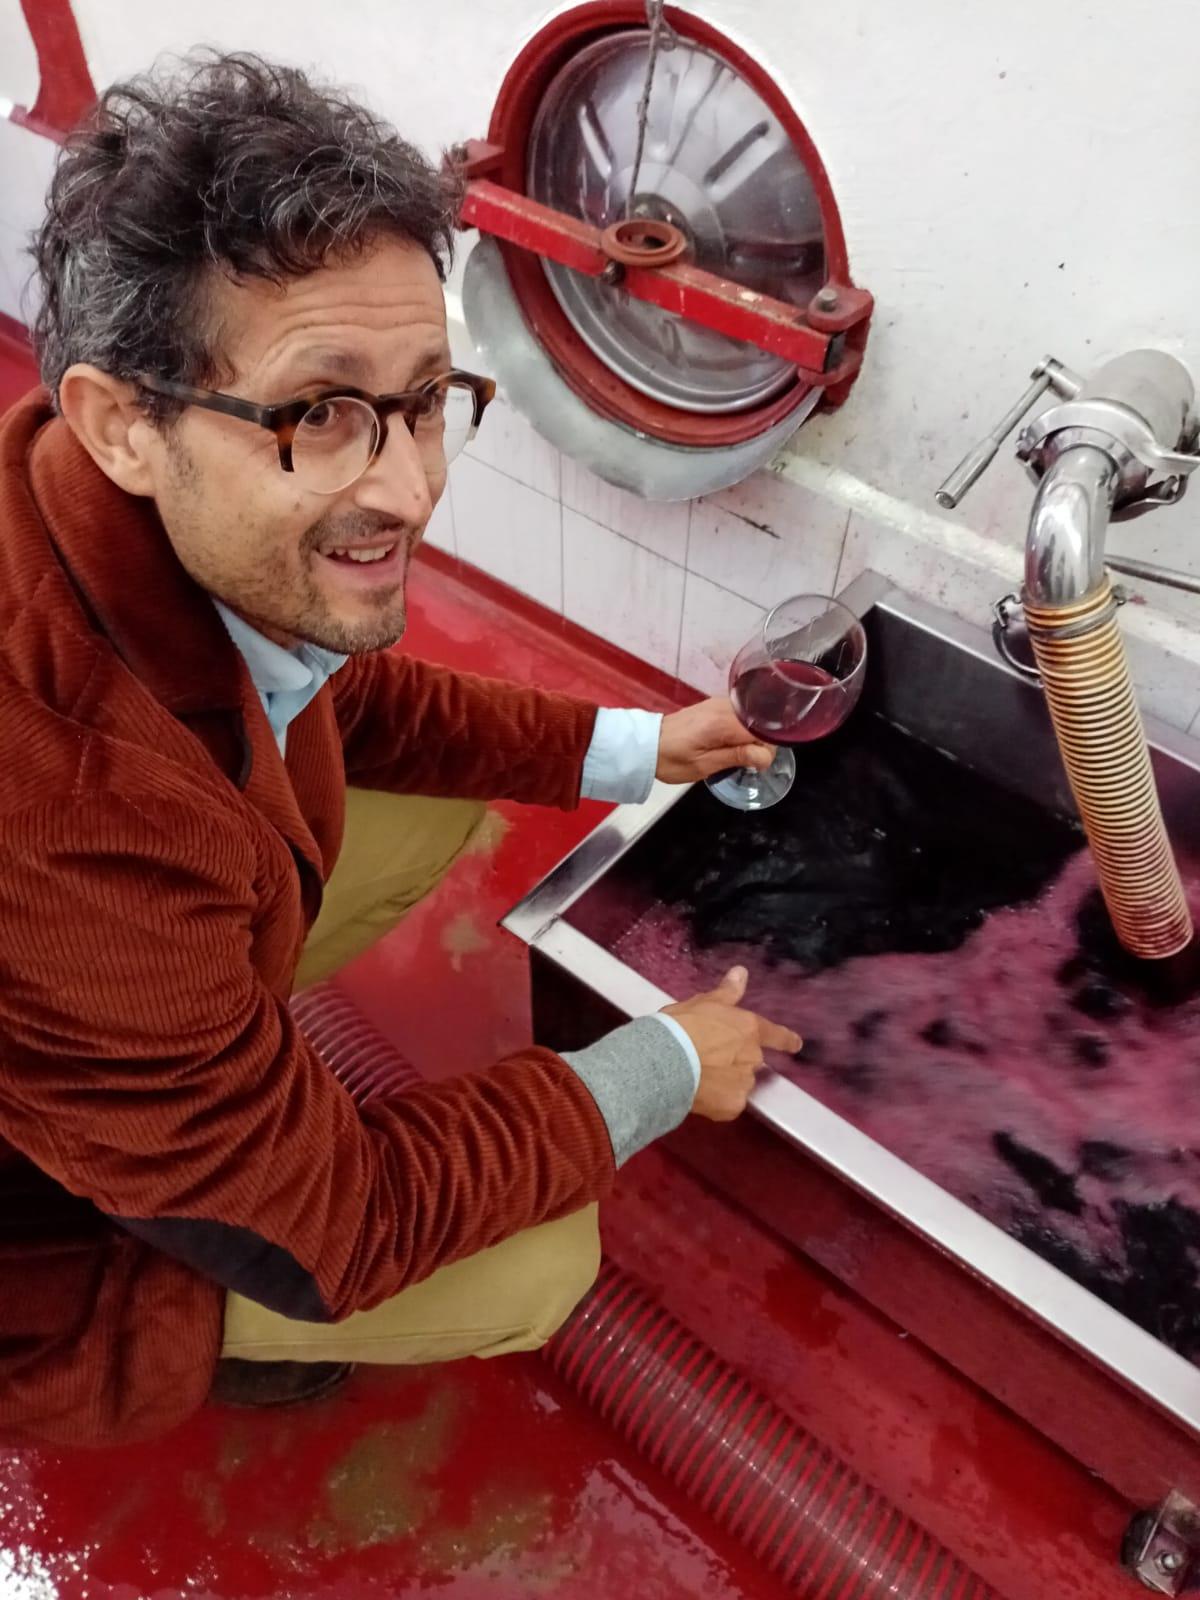 Bicchieri da degustazione vino rosso: tutti i segreti